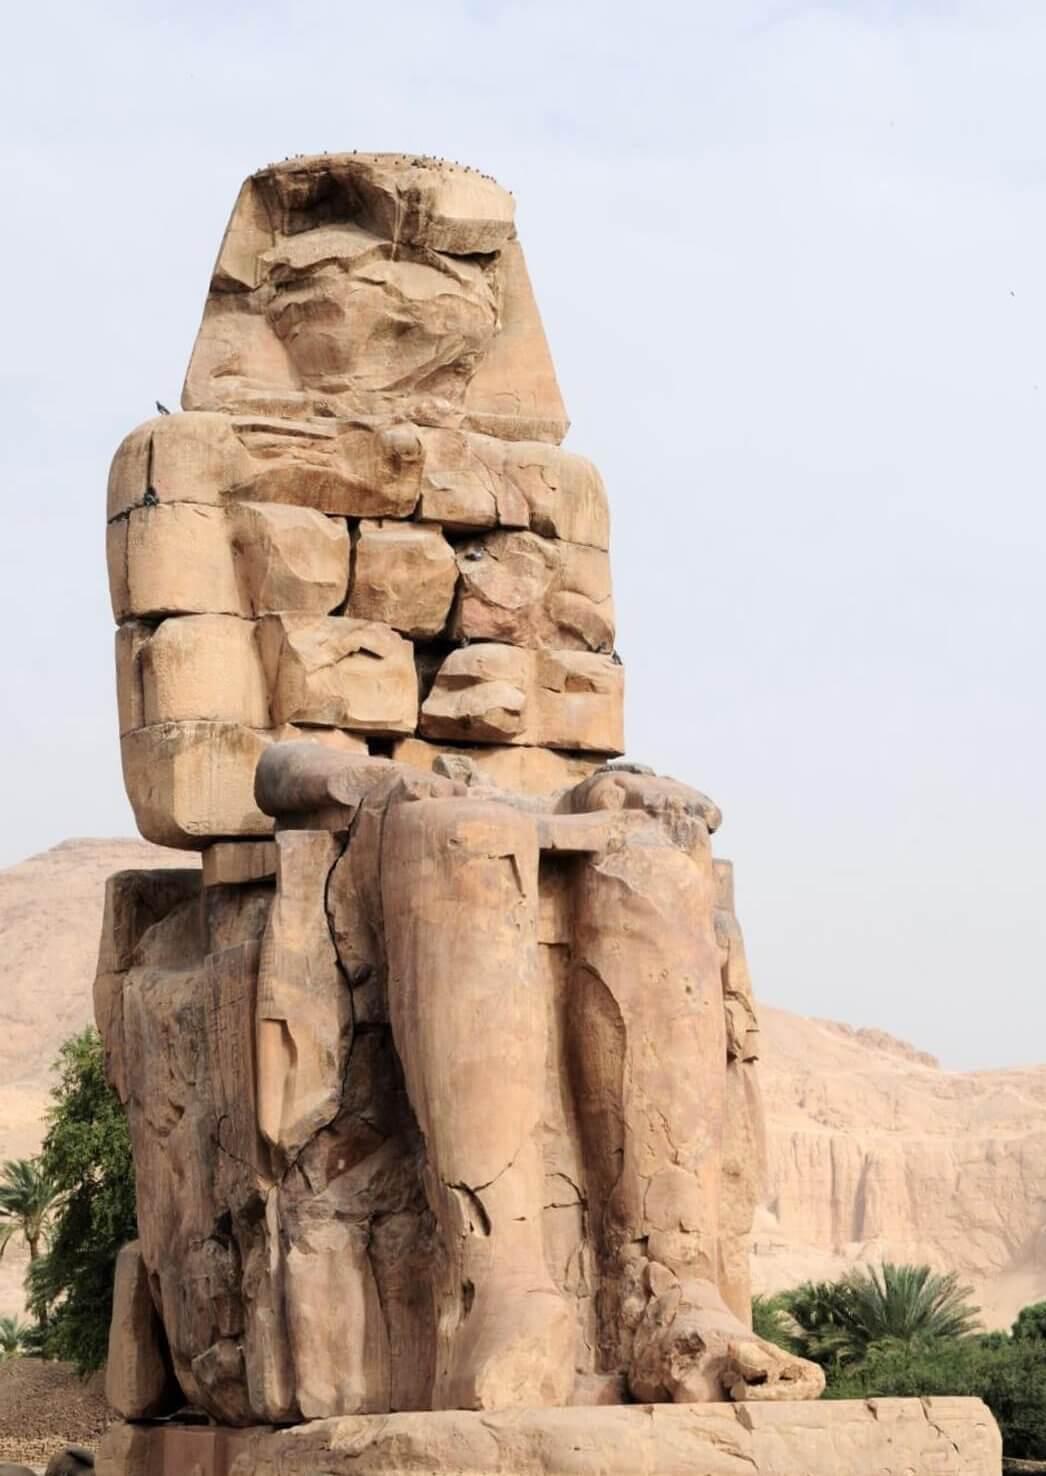 Nijlcruise Egypte piramides tempels